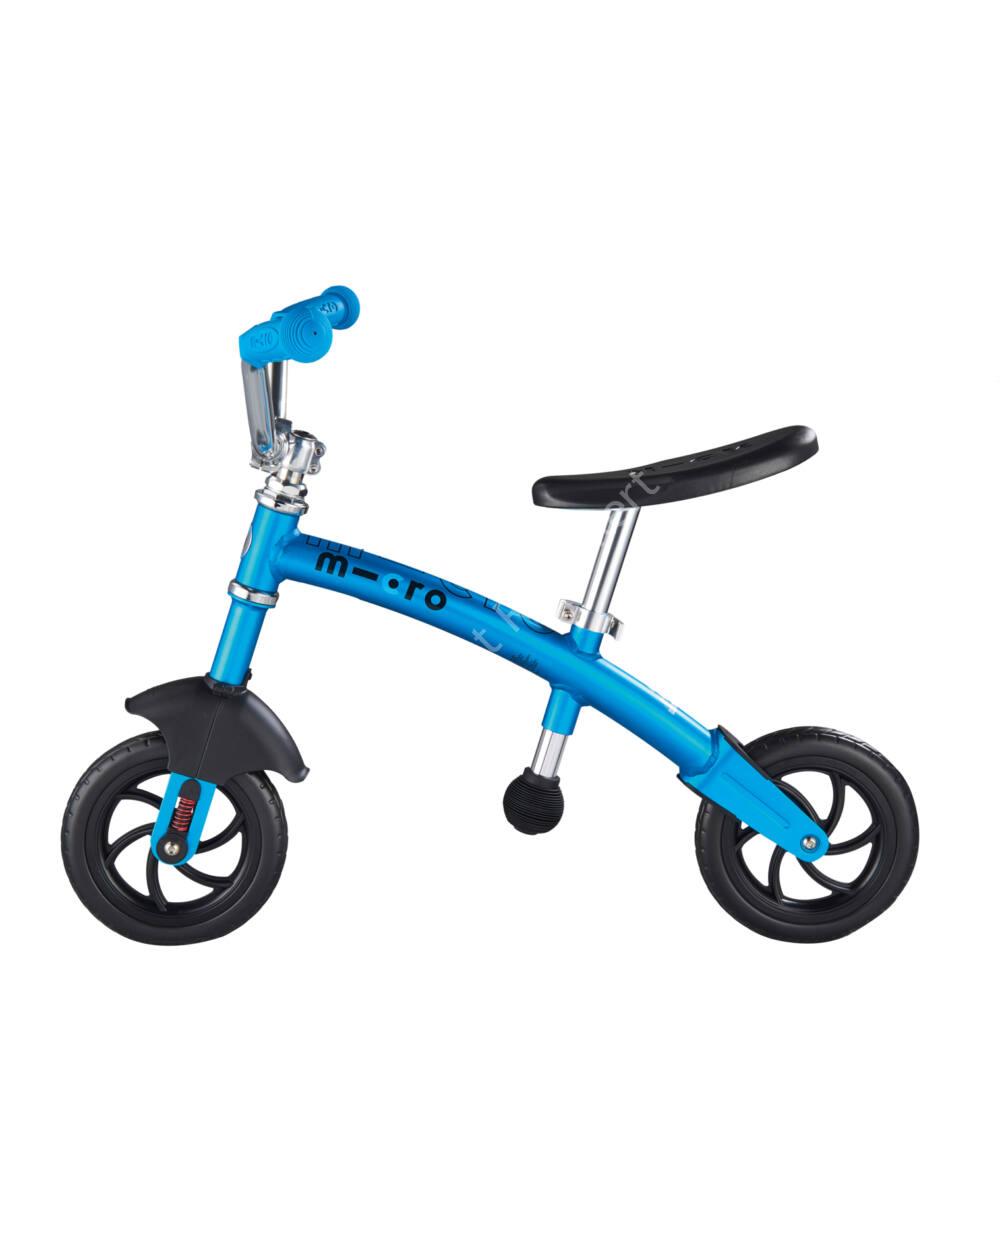 Micro 2in1 G-Bike Chopper Deluxe futóbicikli, kék